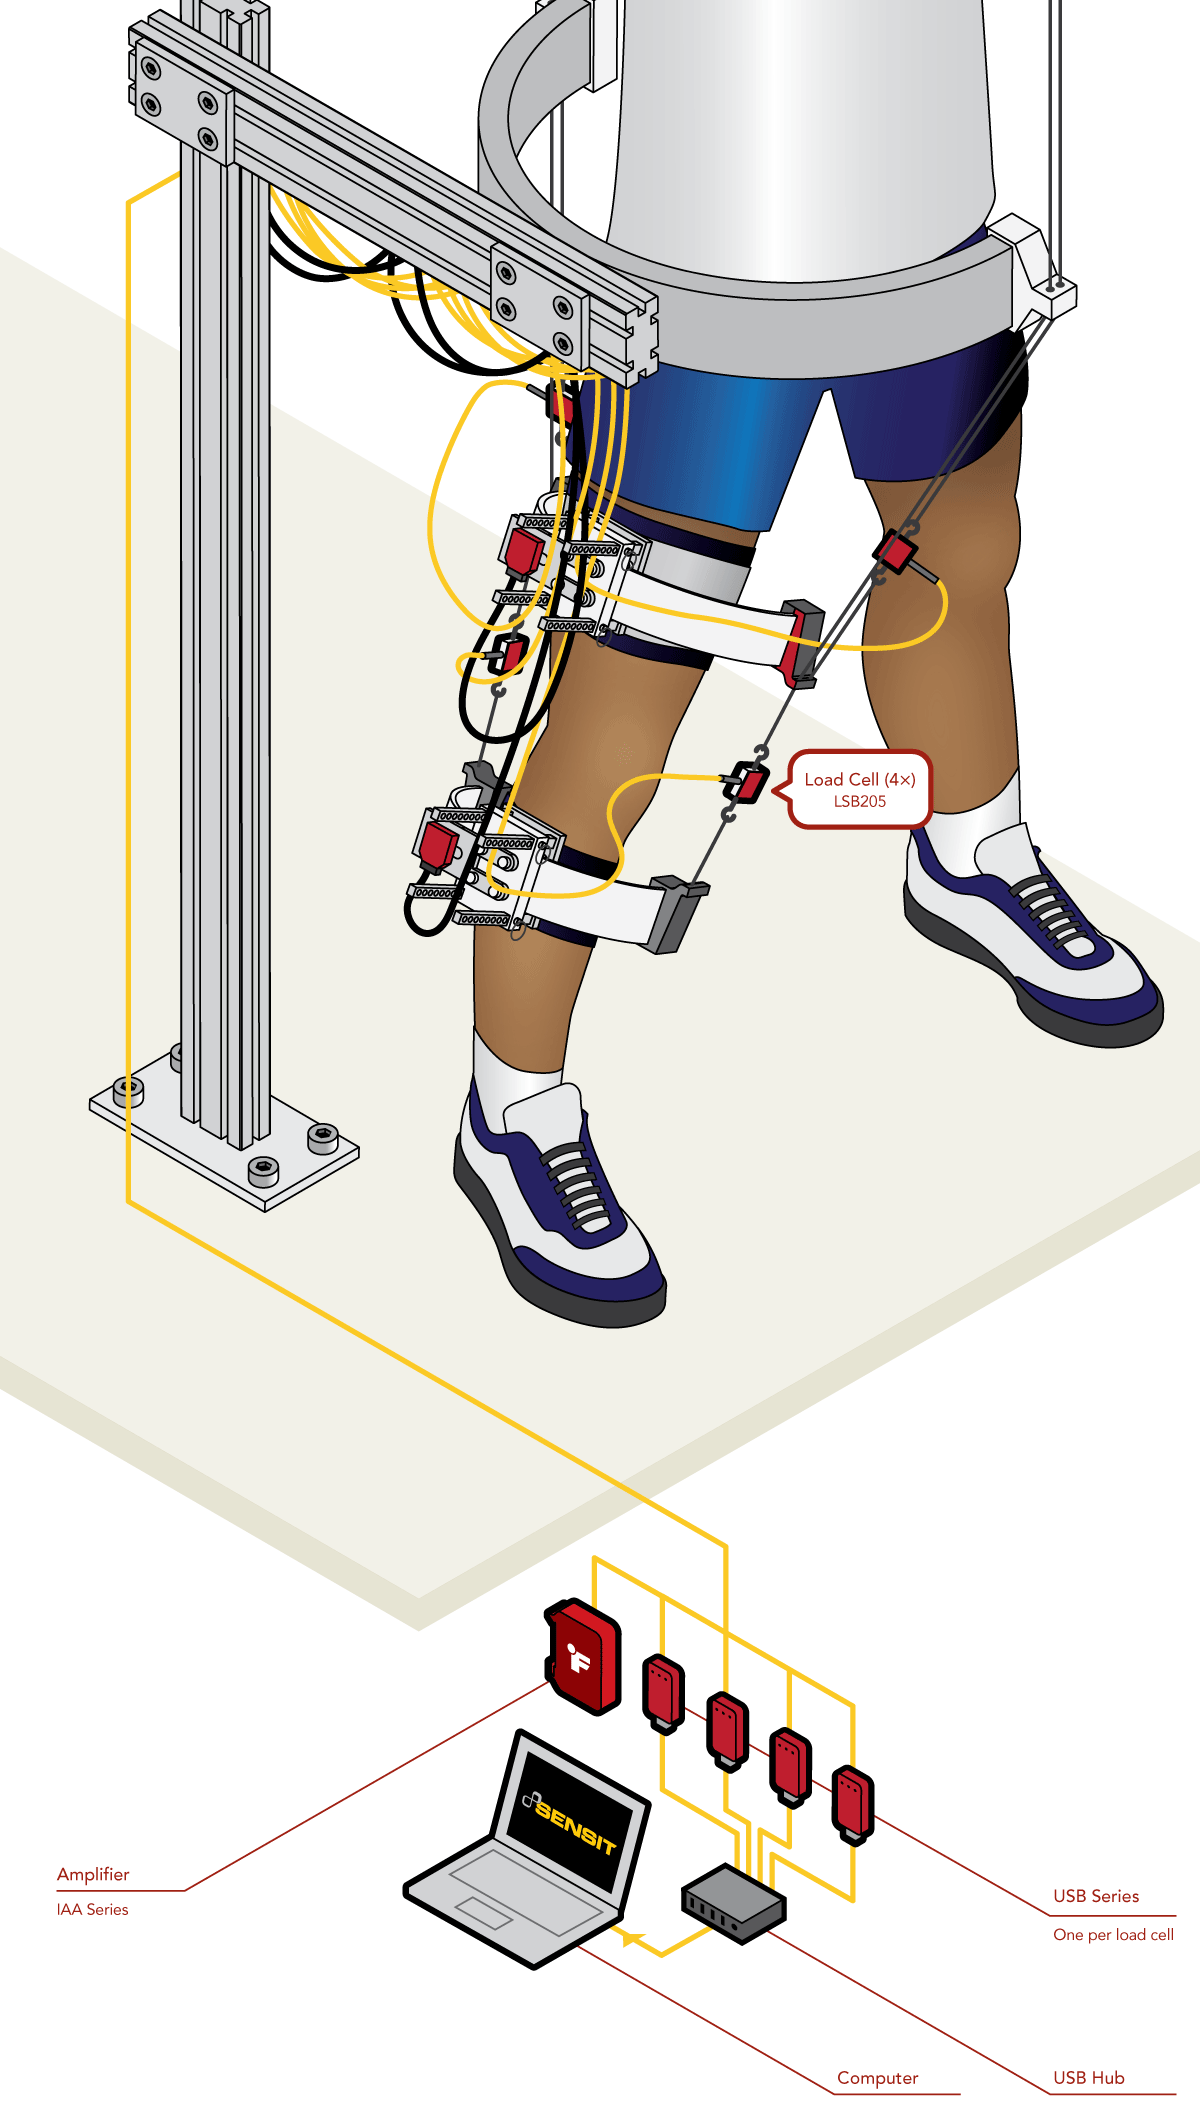 Robotic Leg Rehabilitation Device